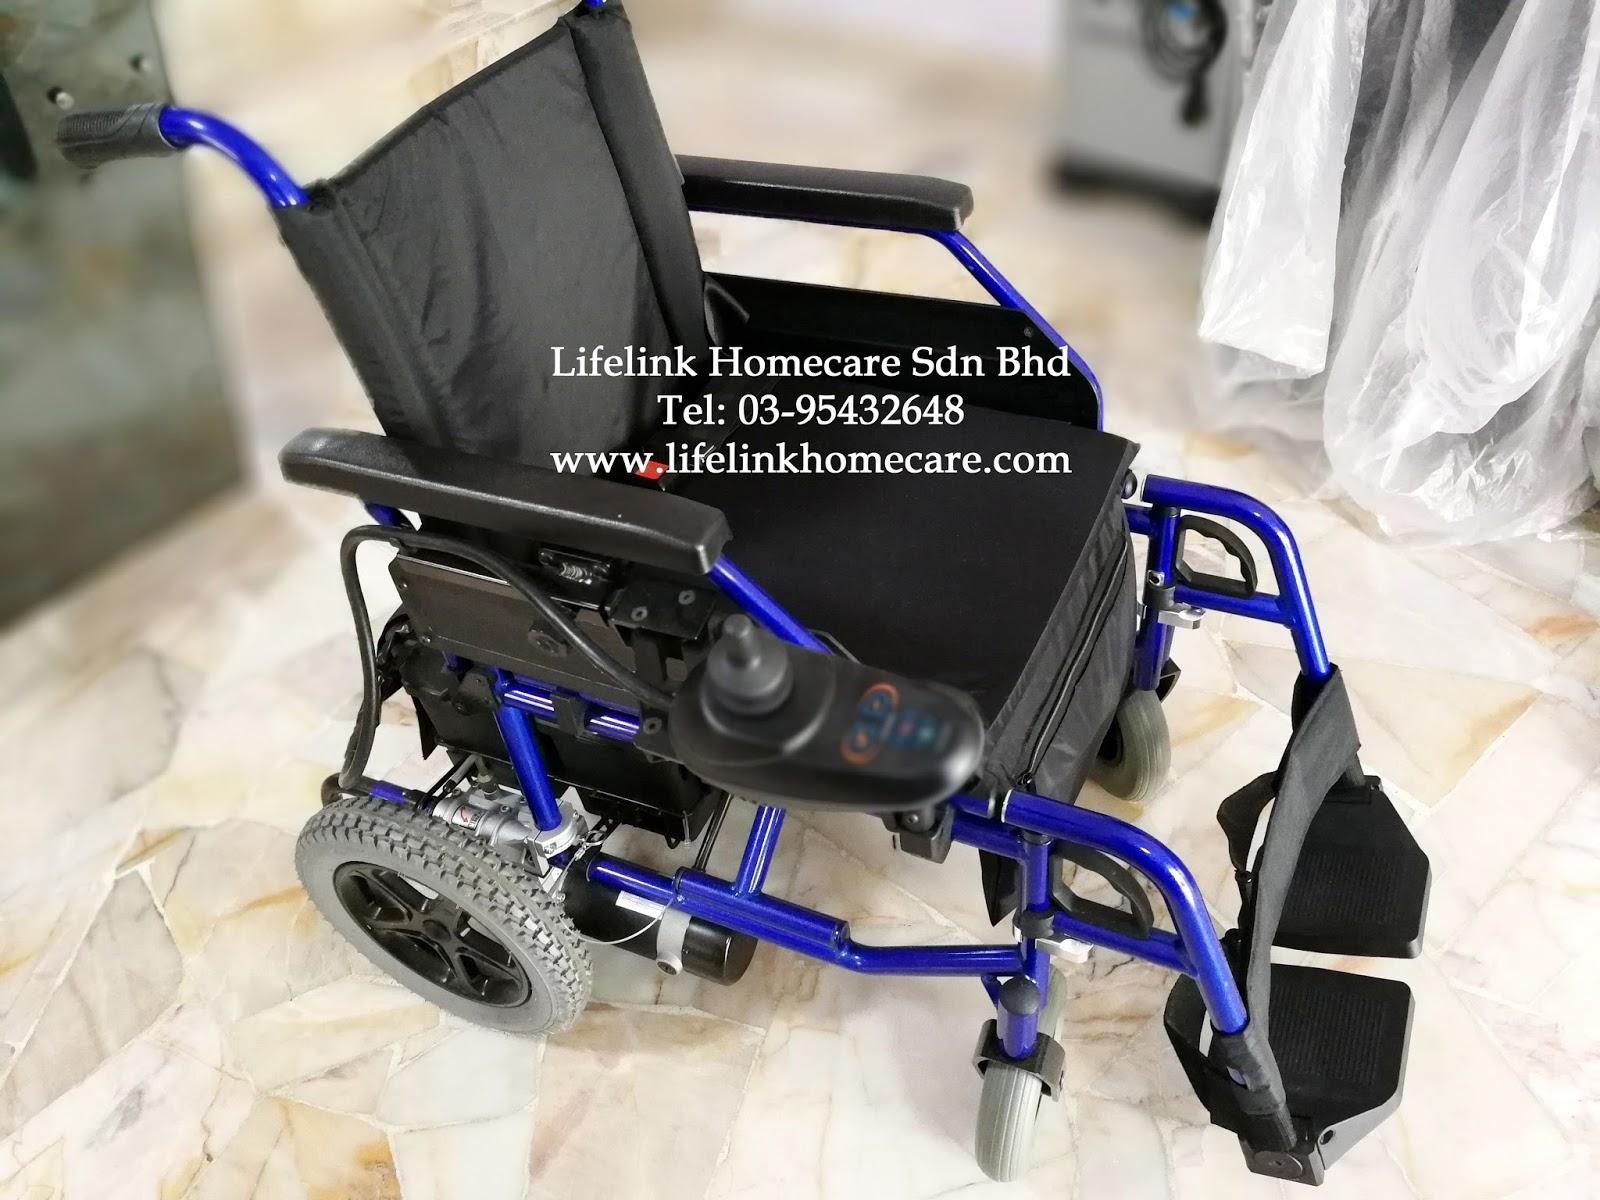 Lifelink Homecare Sdn Bhd